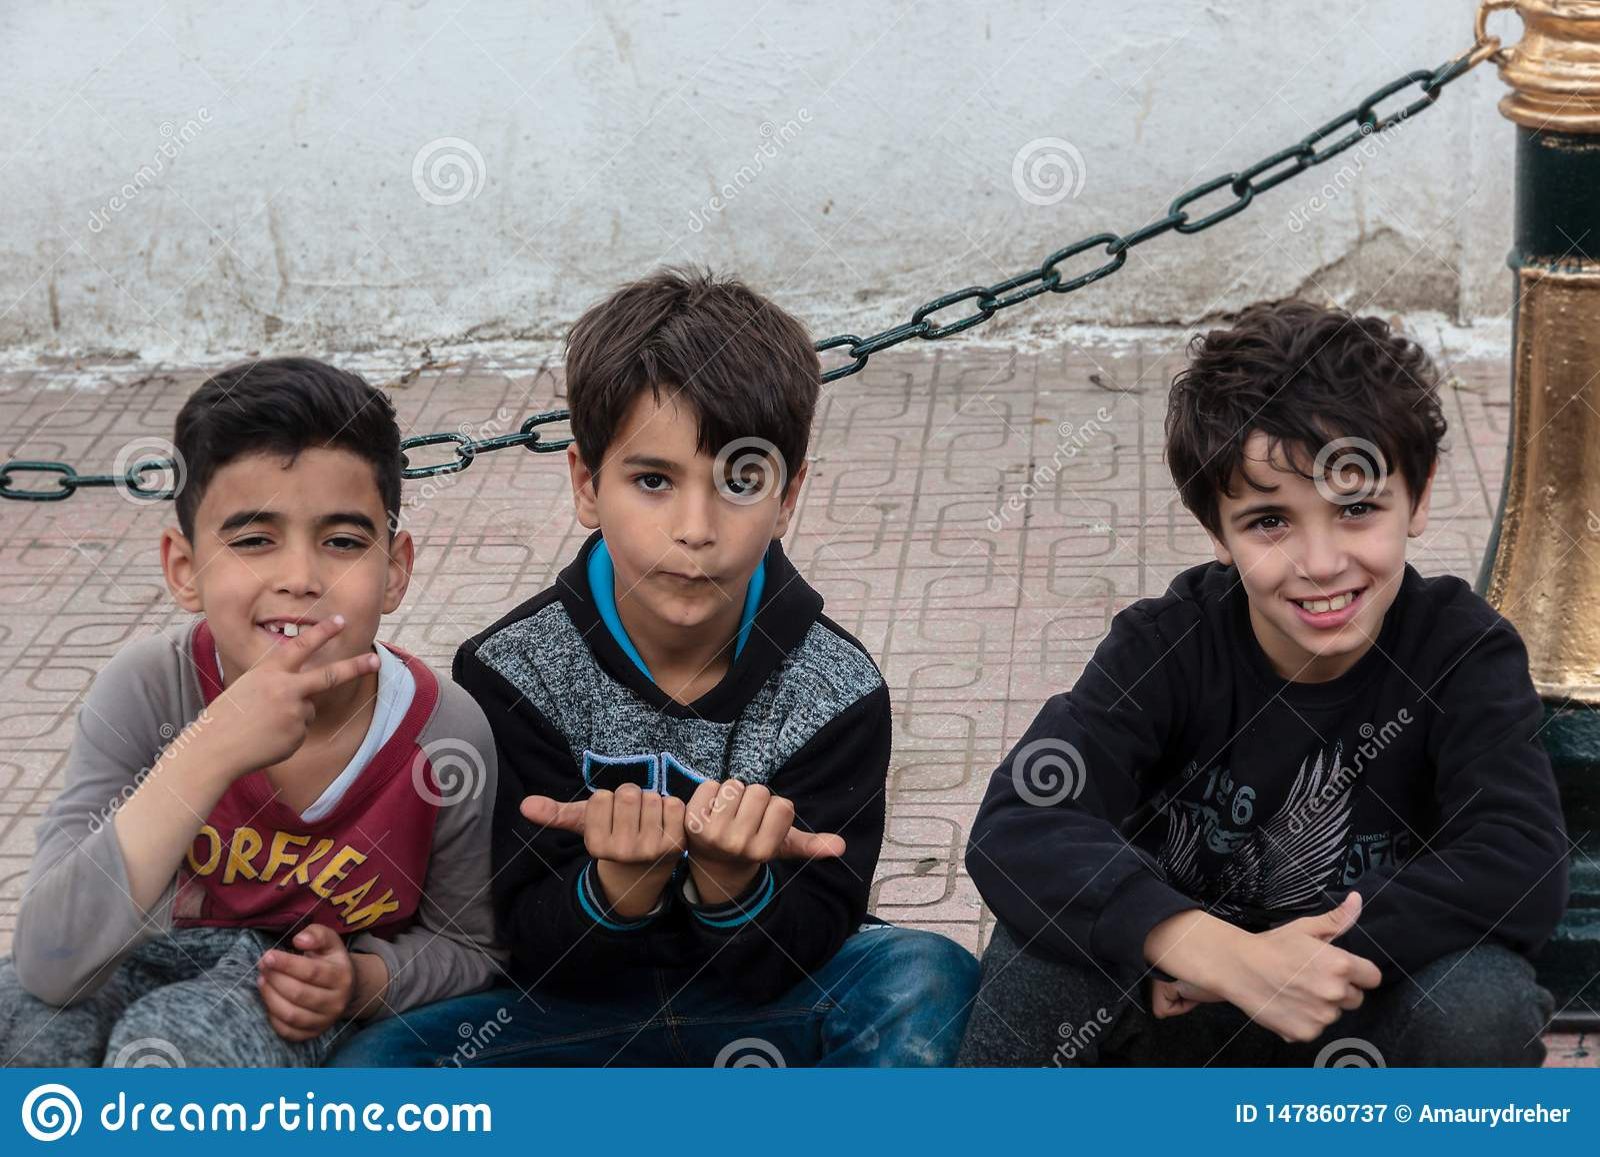 Three algerian boys smiling at me